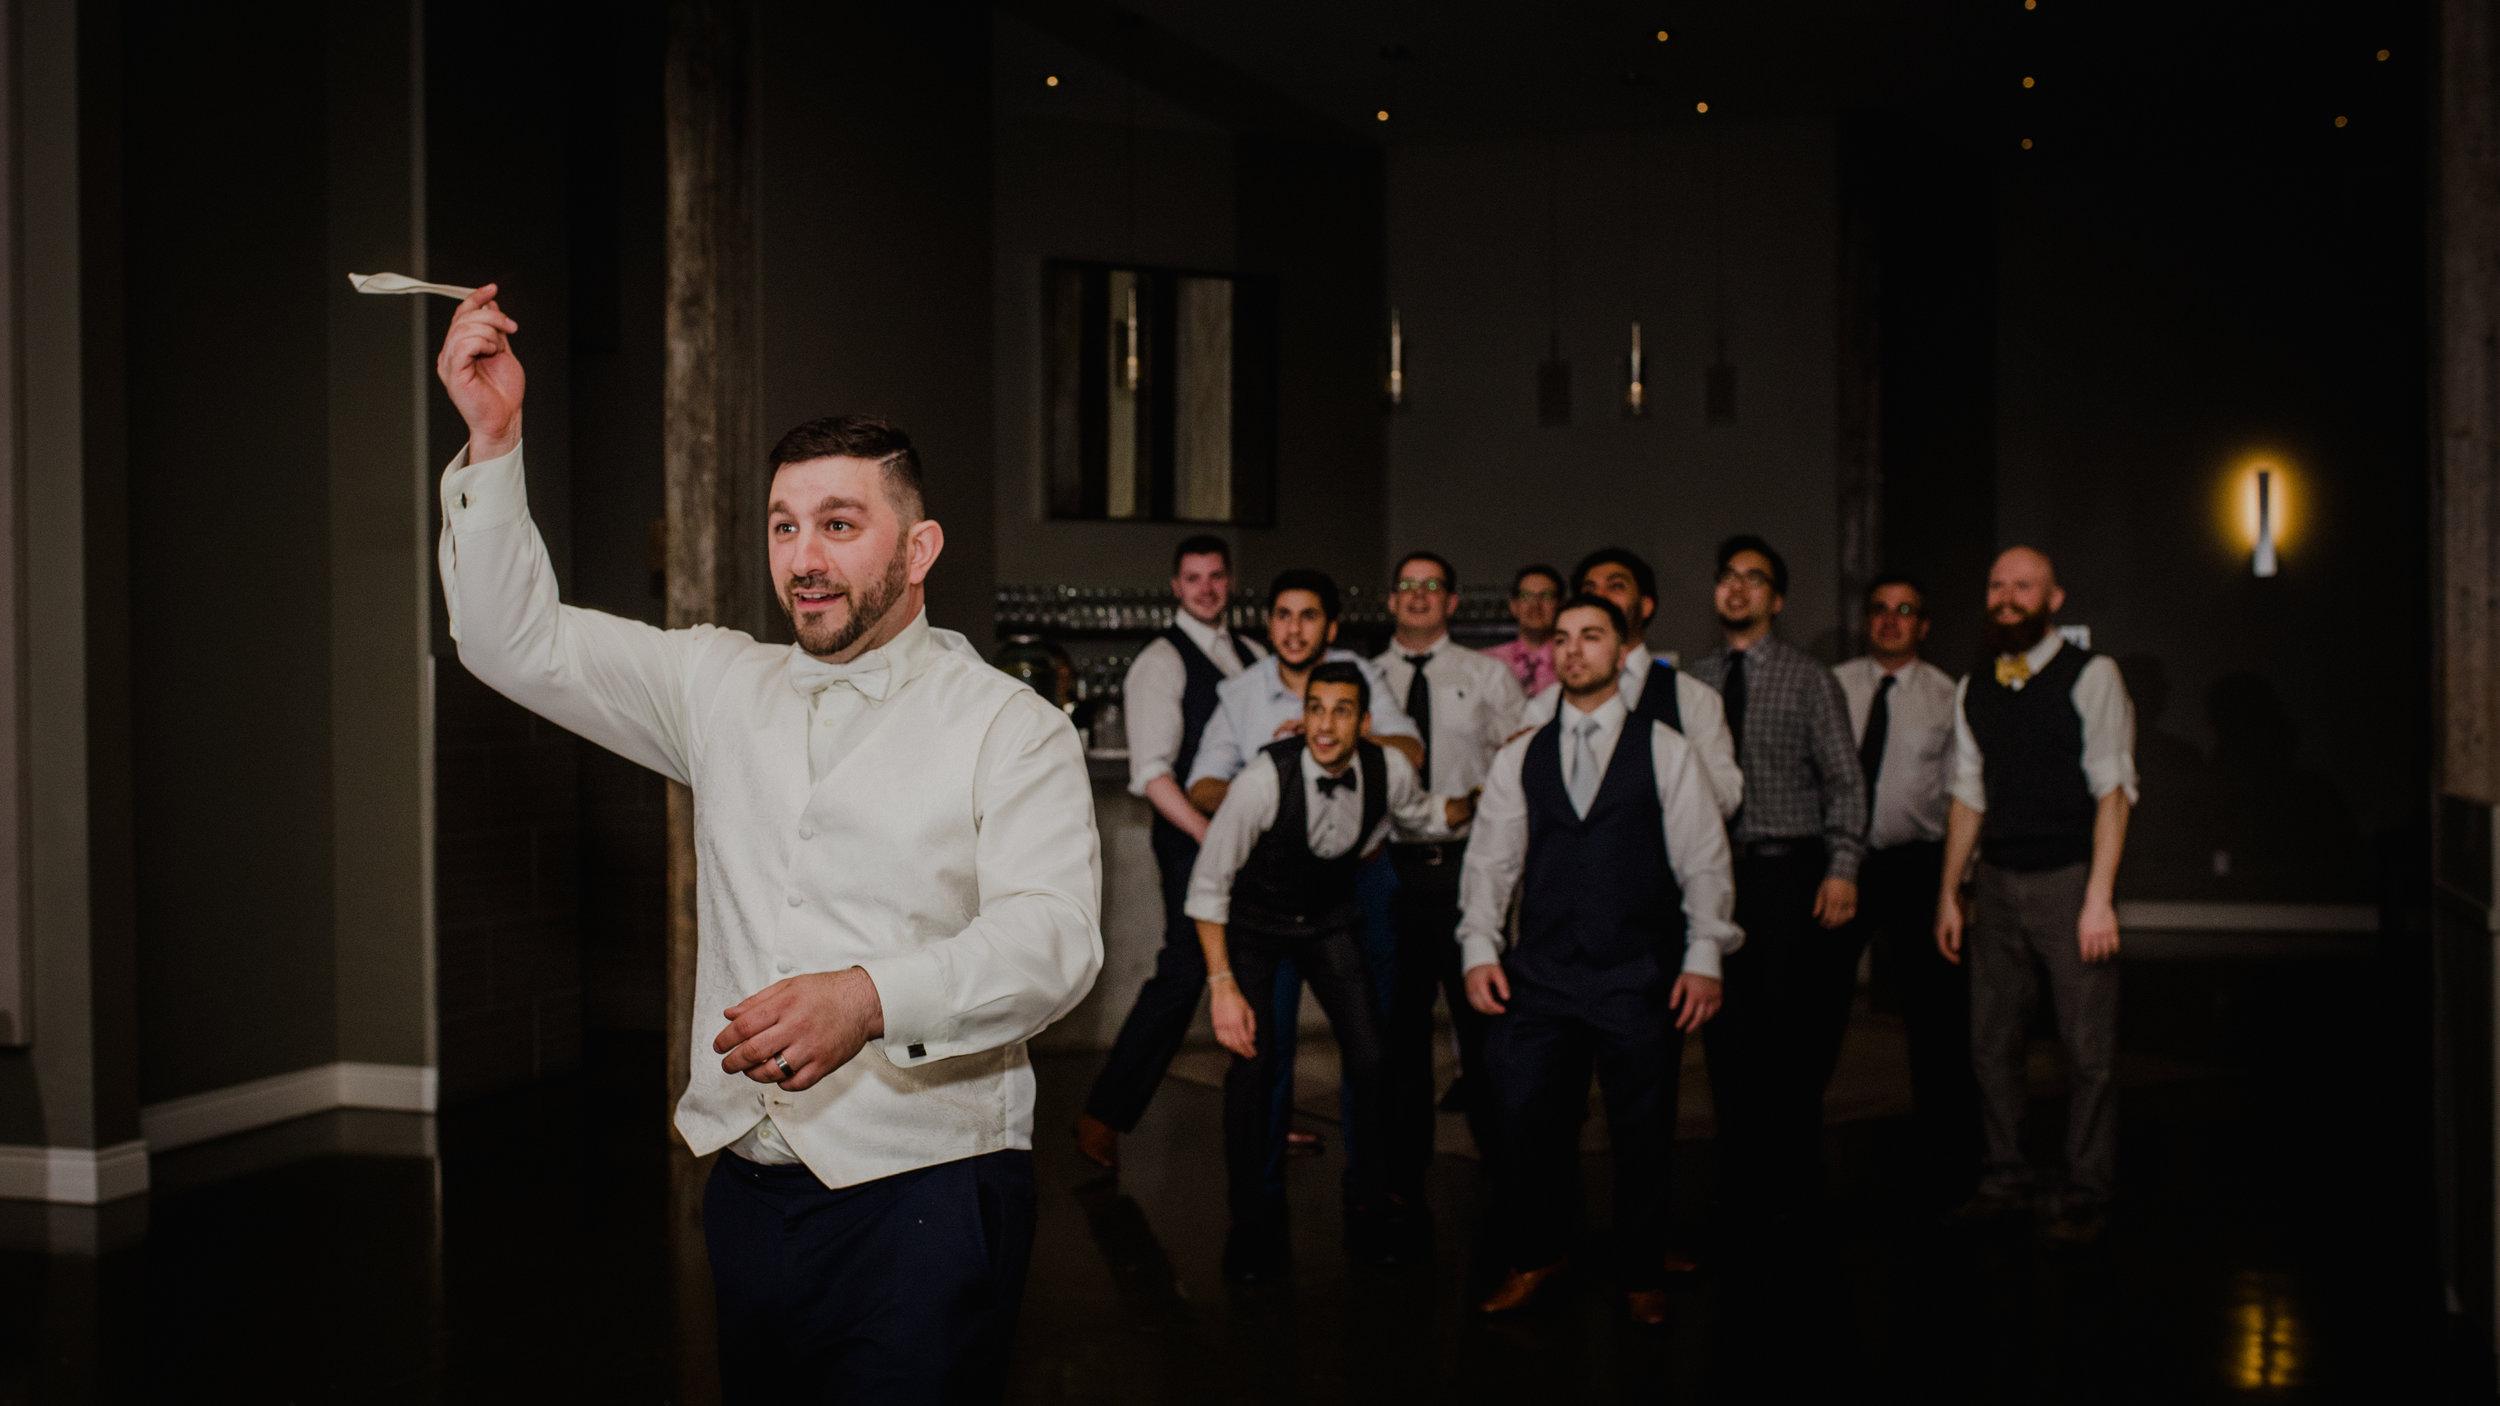 e Belvedere, Wakefield Wedding - Dinner Party 13